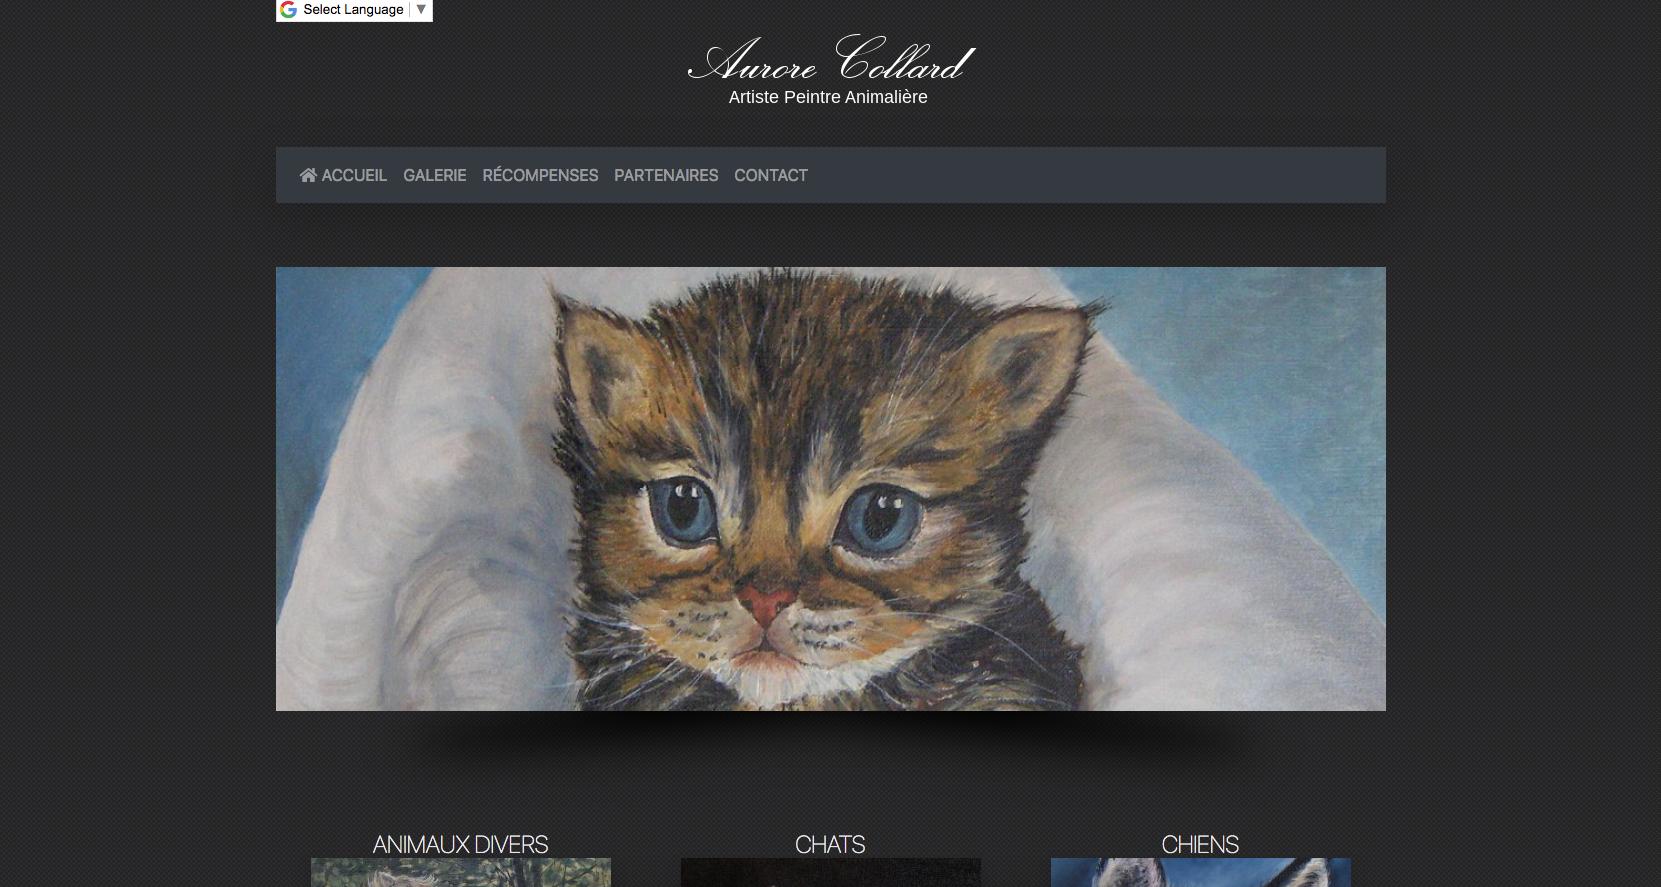 Aurore Collard - Artiste peintre animalière